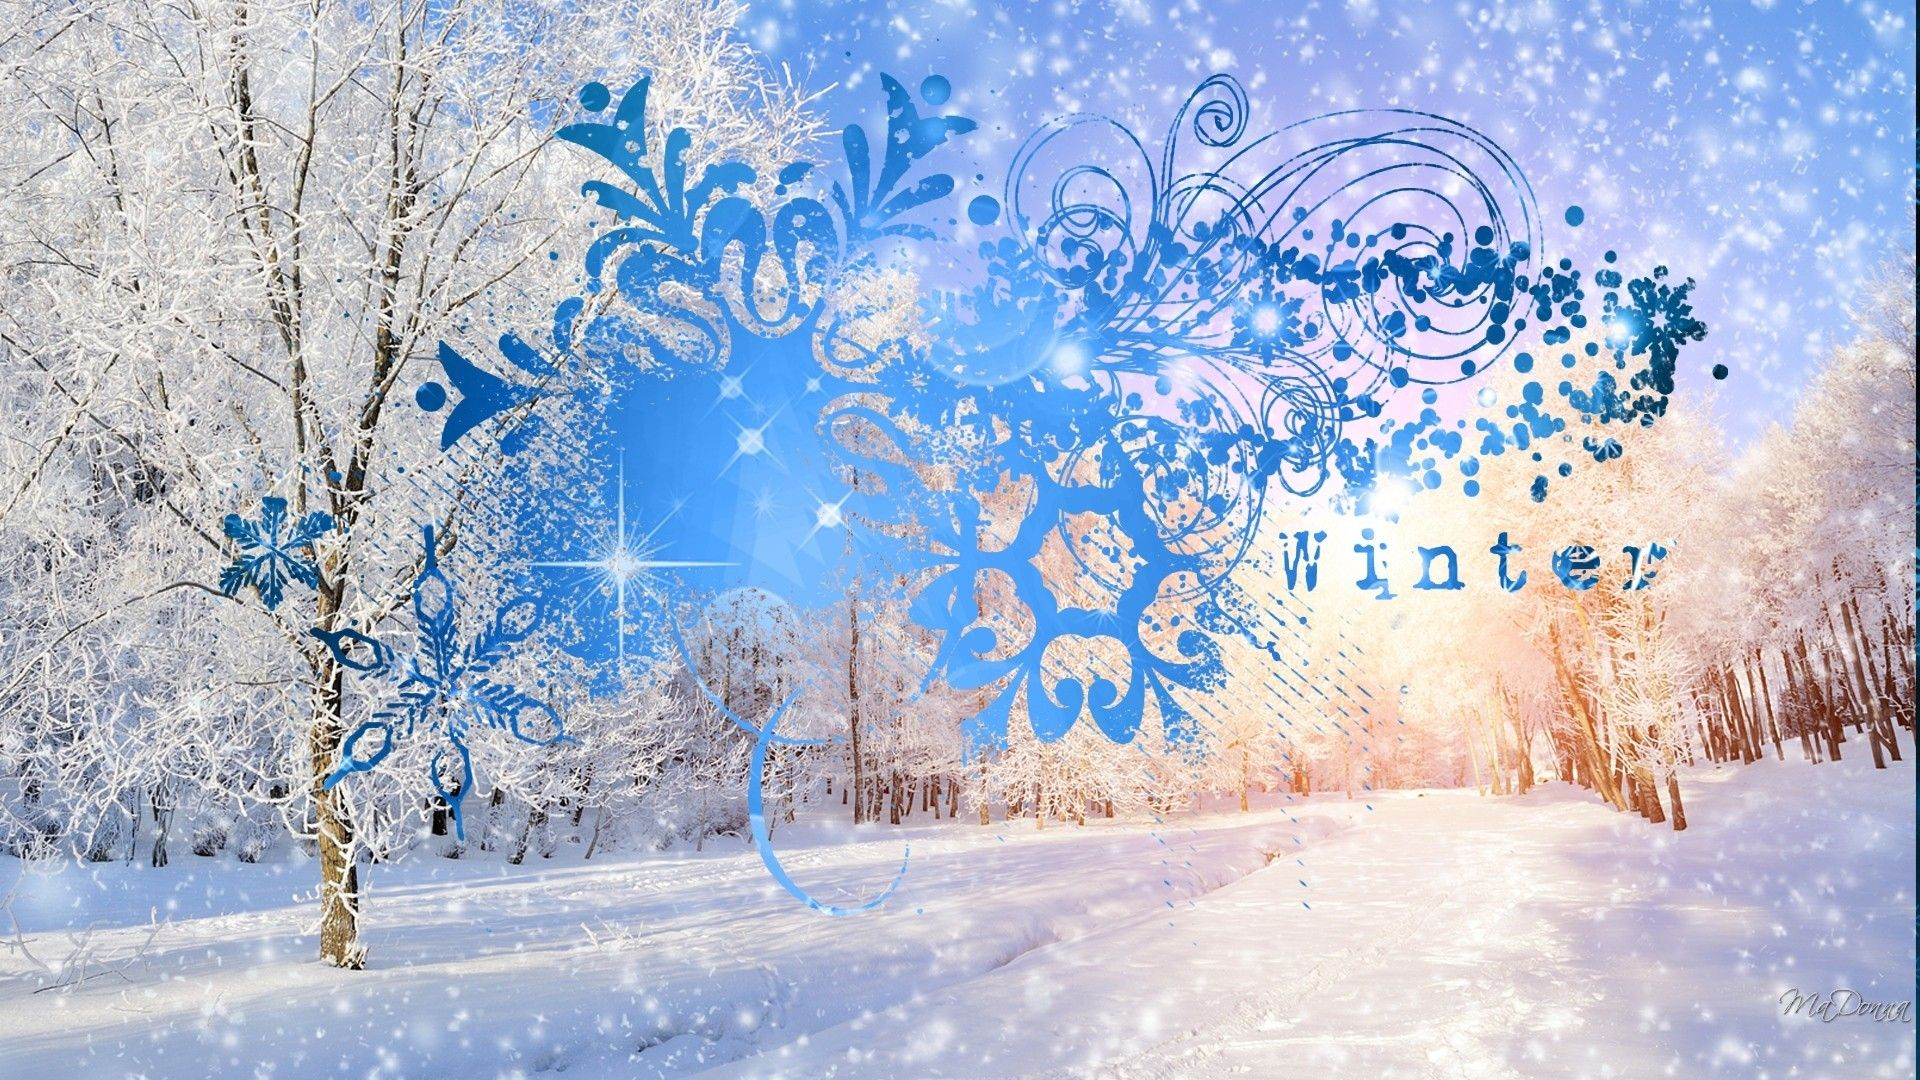 Winter Wonderland Background For Computer